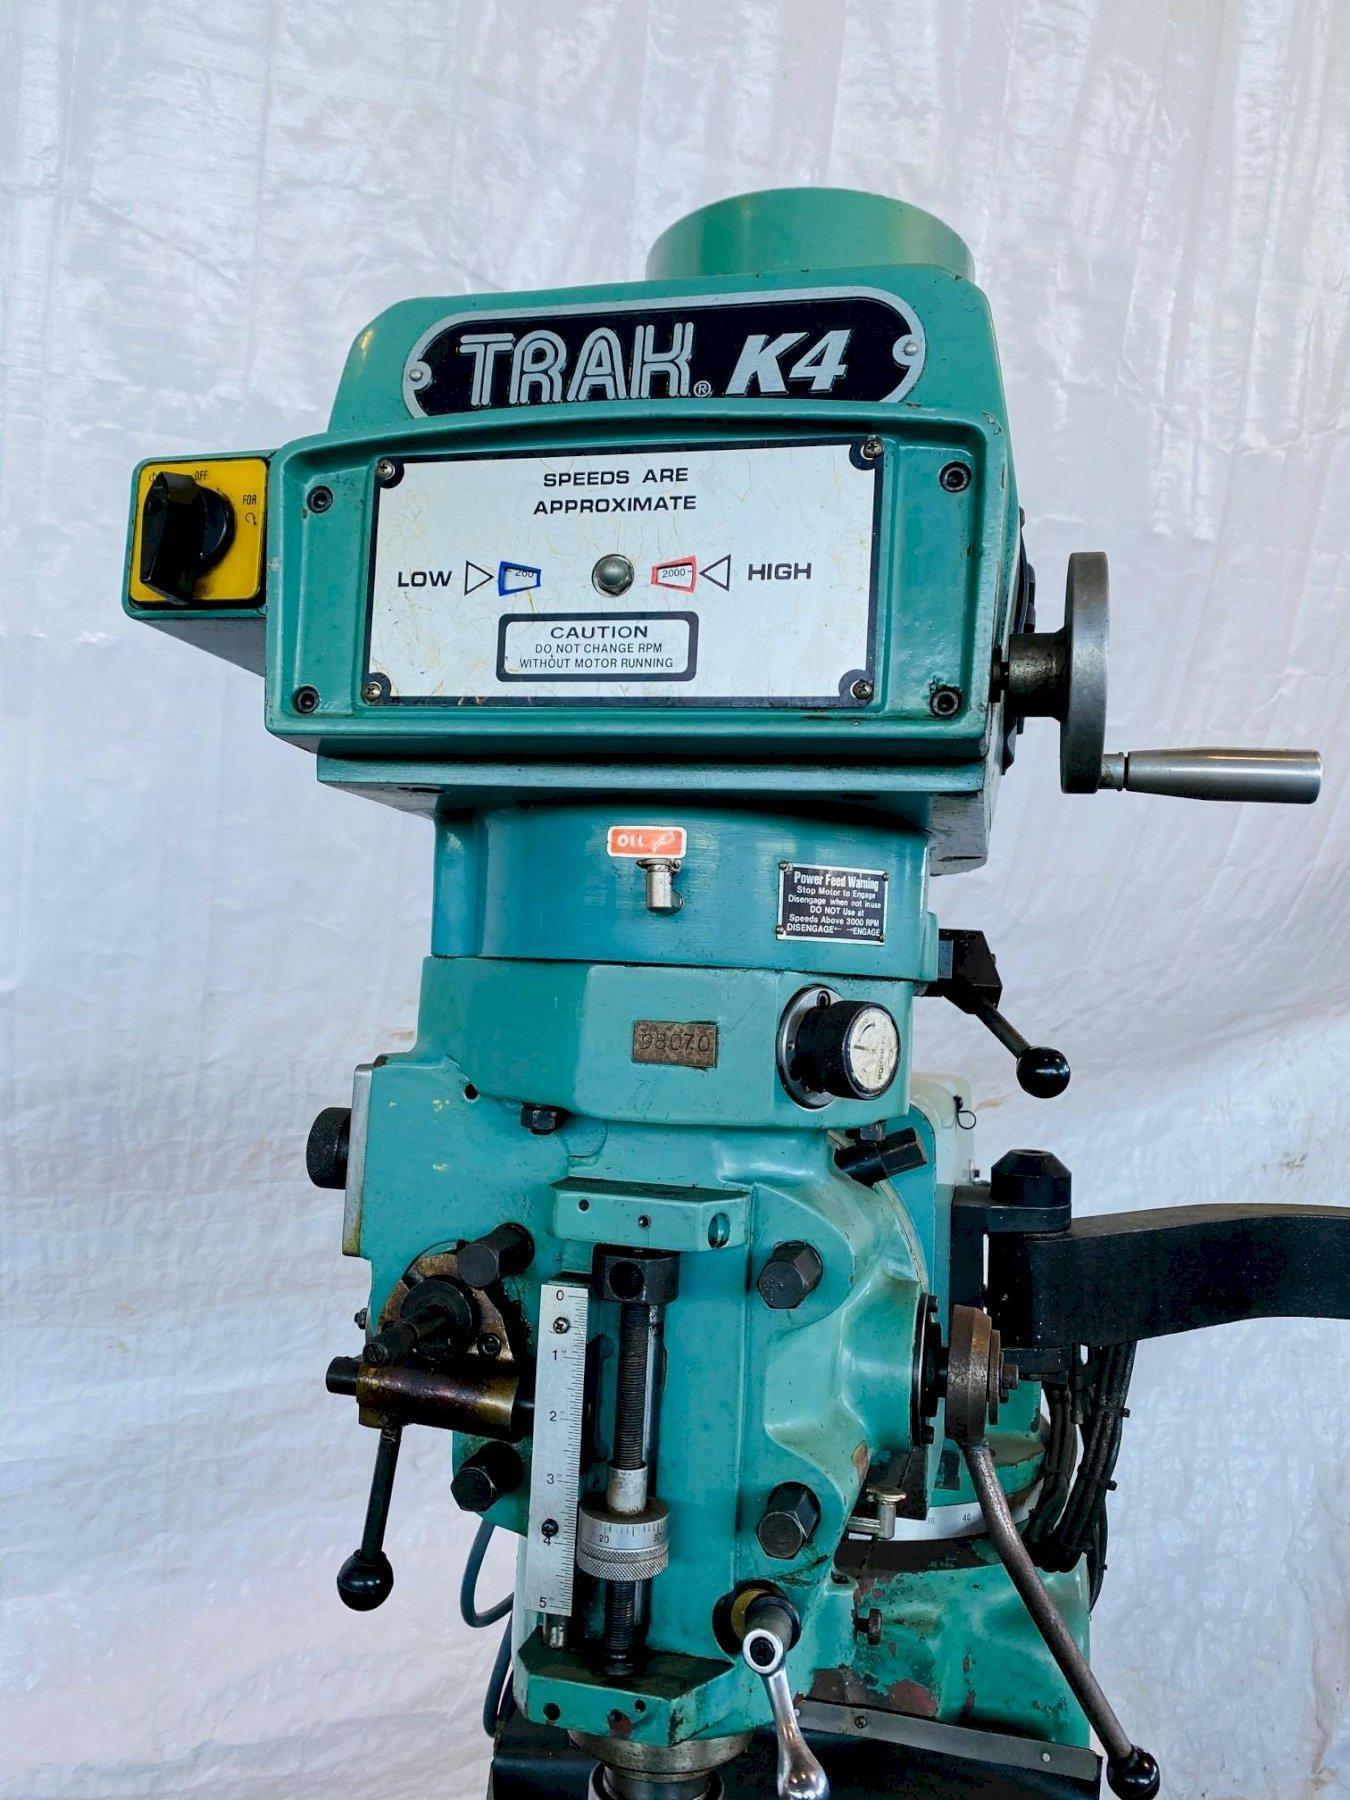 SOUTHWESTERN INDUSTRIES PROTOTRAK K4 CNC MILL. STOCK # 0952020